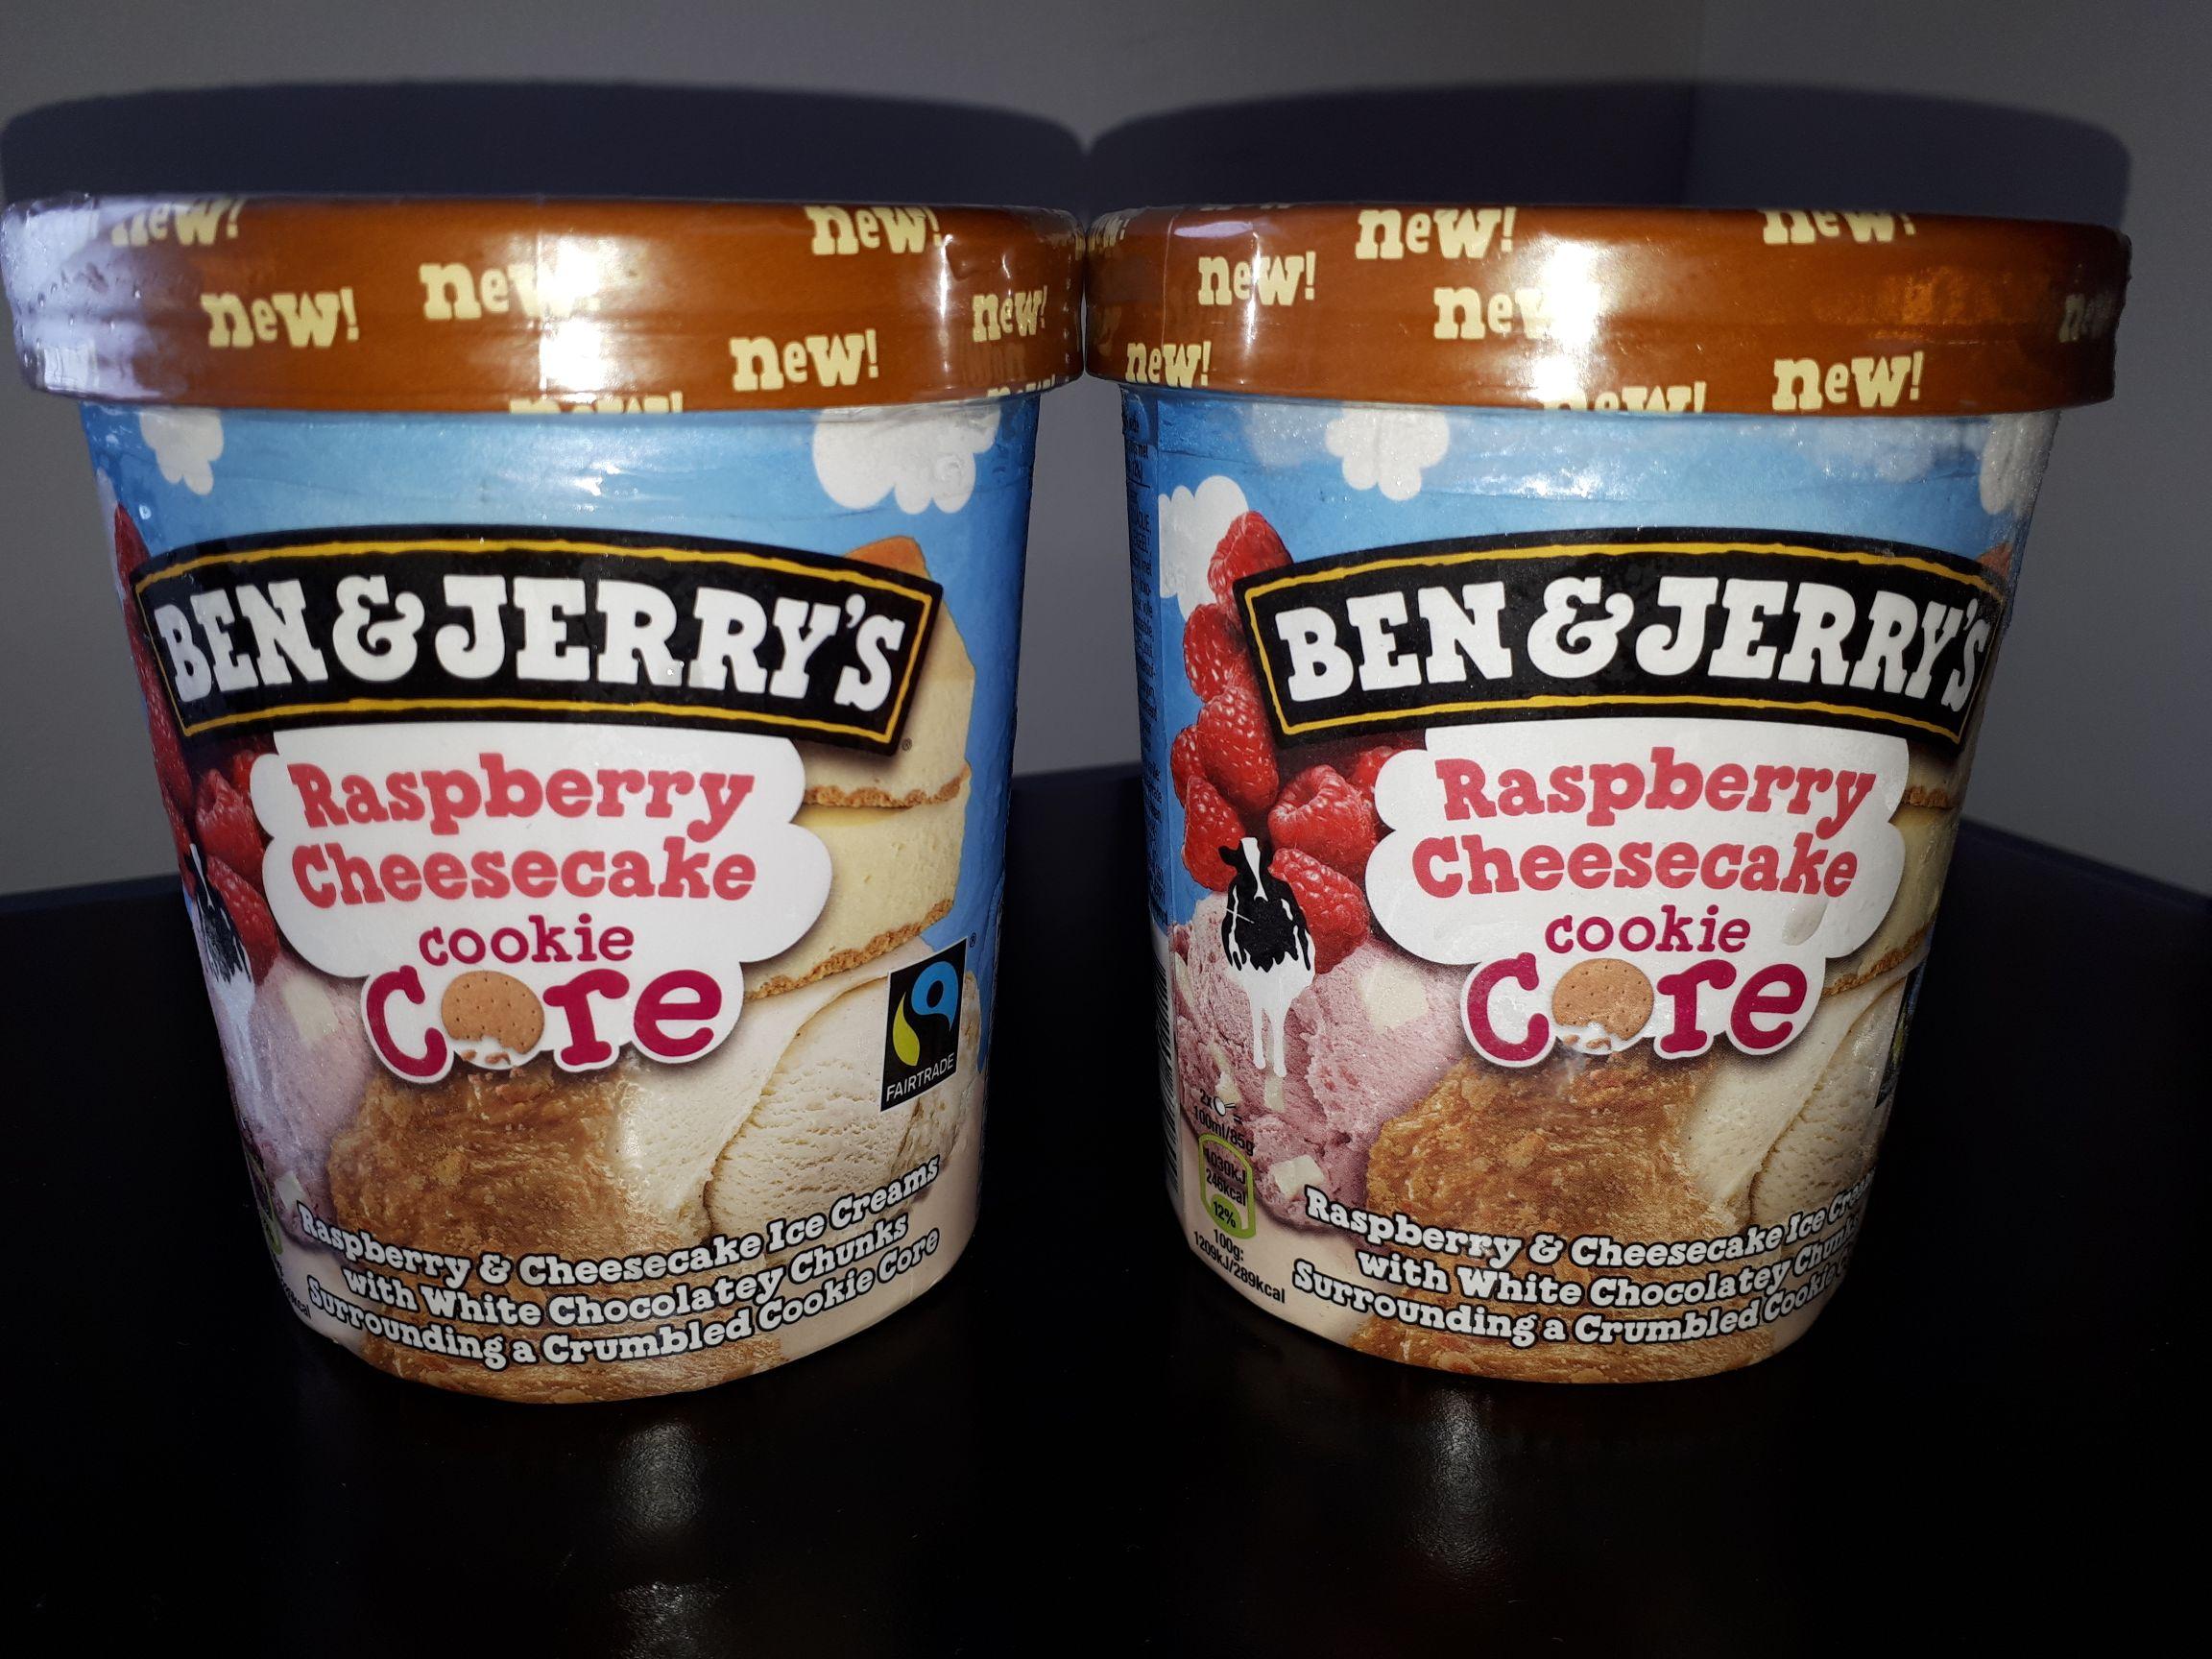 (lokal) Ben & jerry's raspberry cheesecake Grenzgänger NL ter huurne HollandMarkt